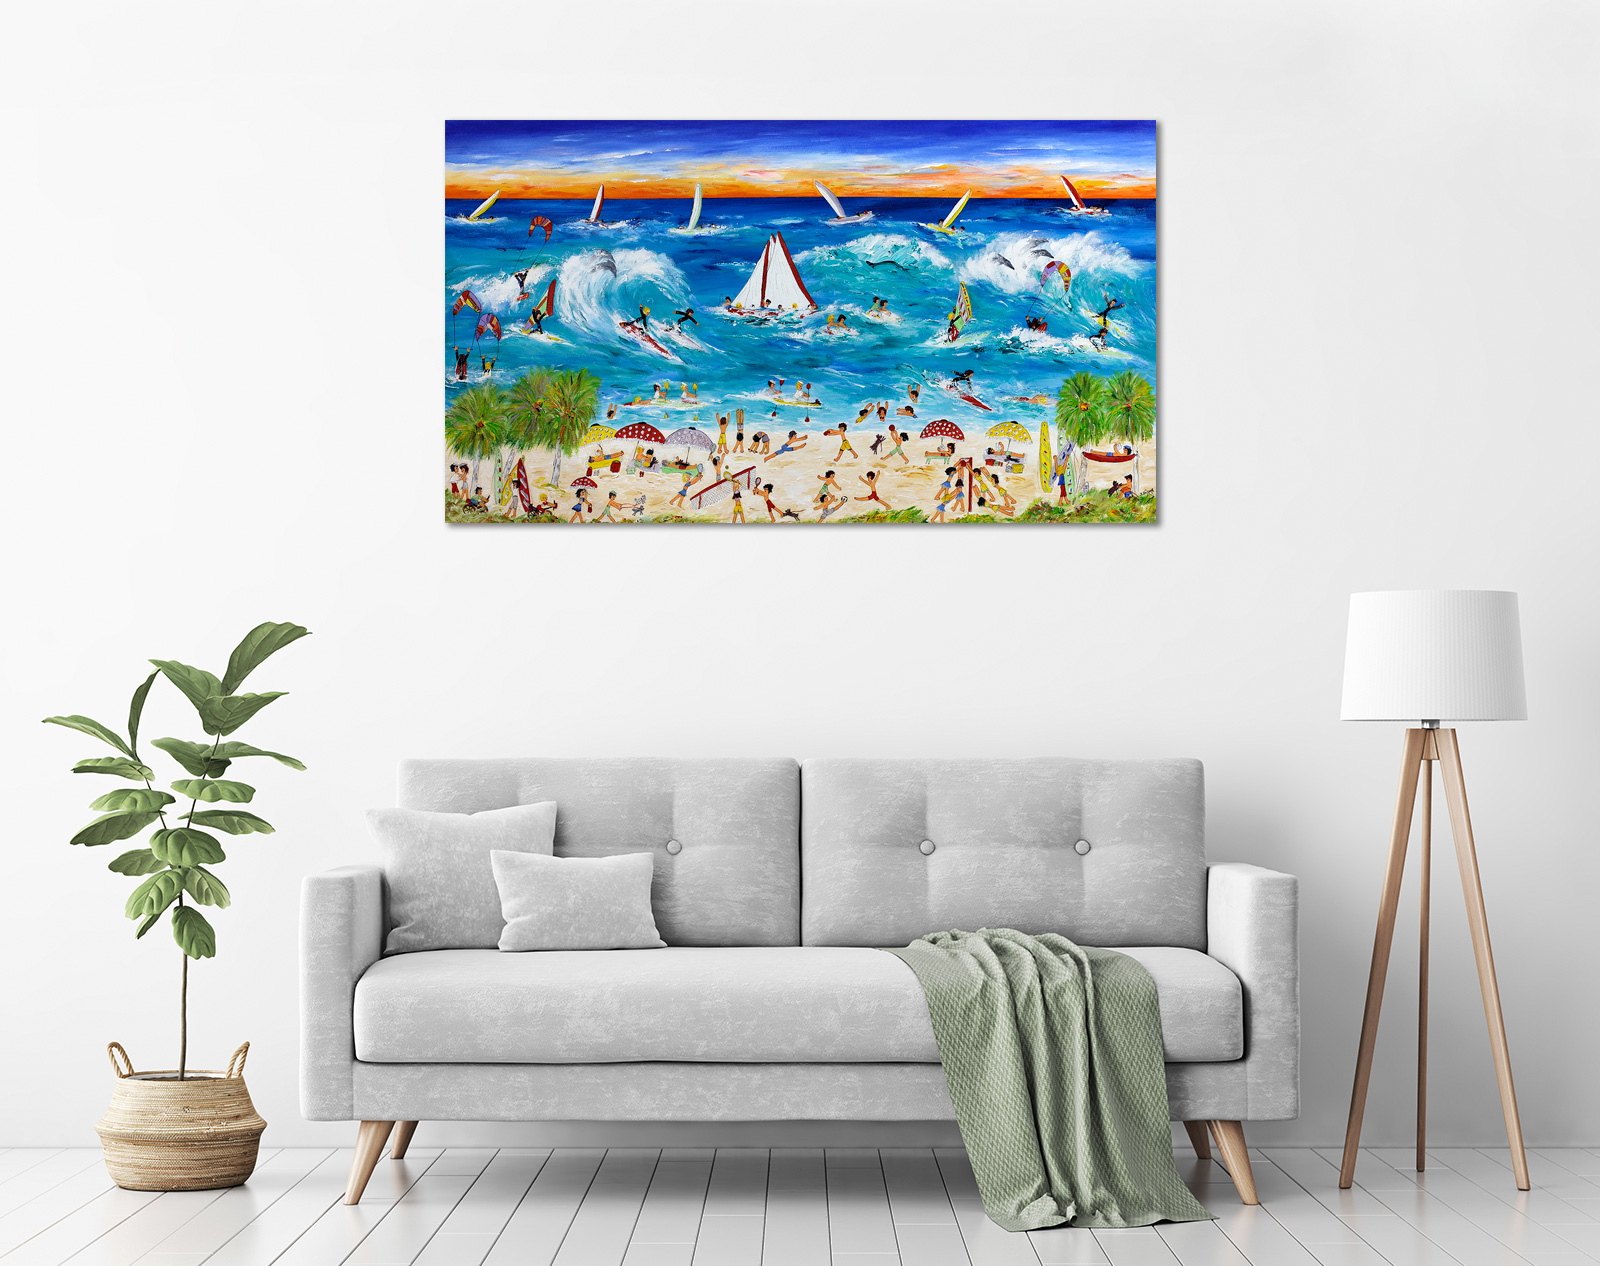 Ida Ernhardt - 'Adventure Beach Holiday' in a room